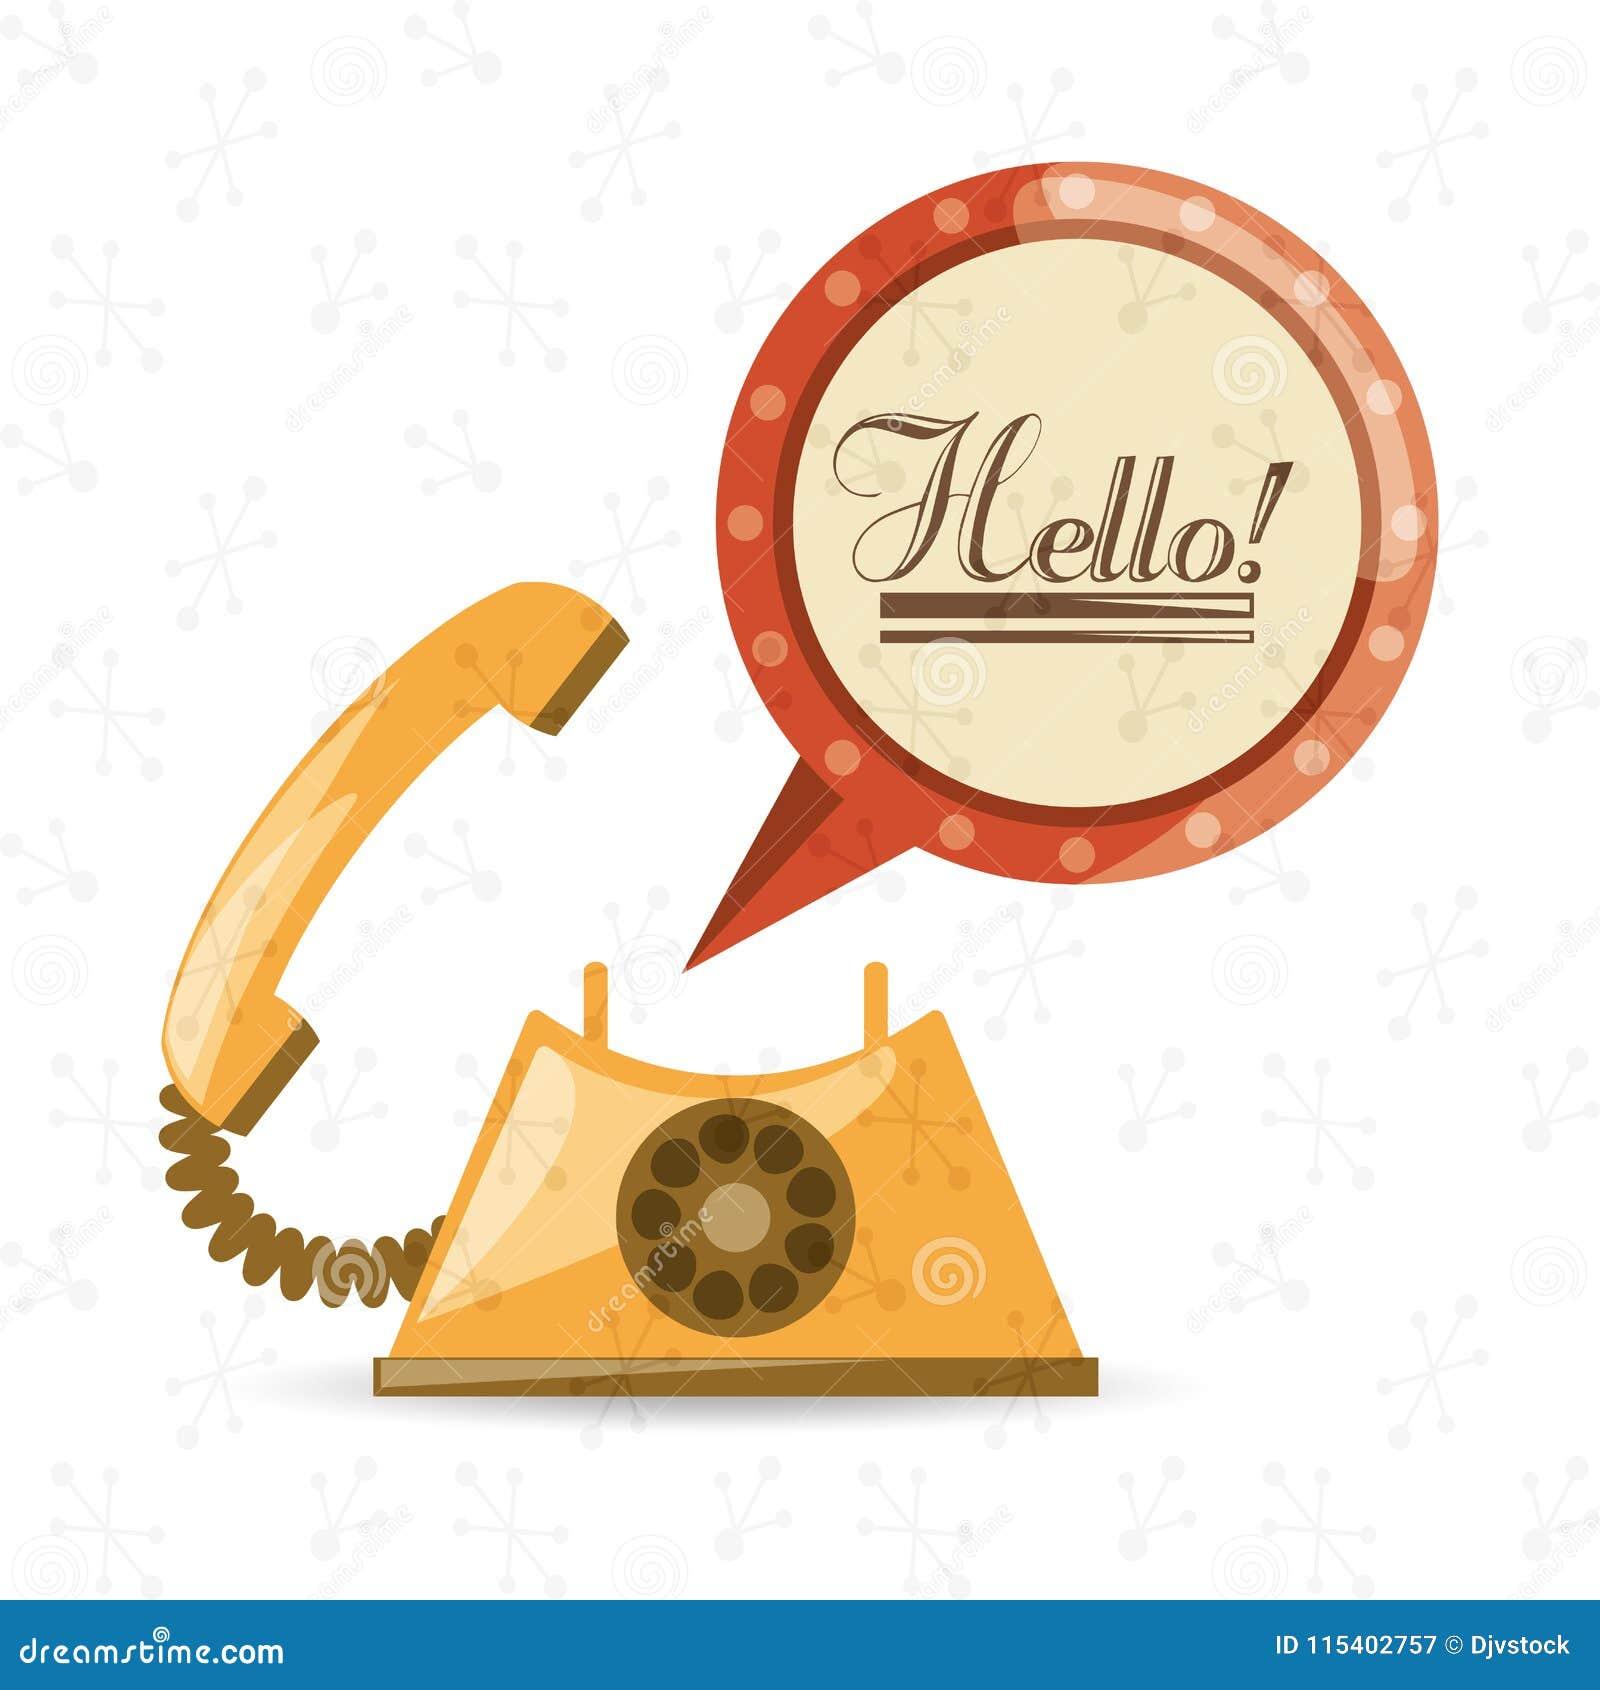 Telefone retro a chamar e falar